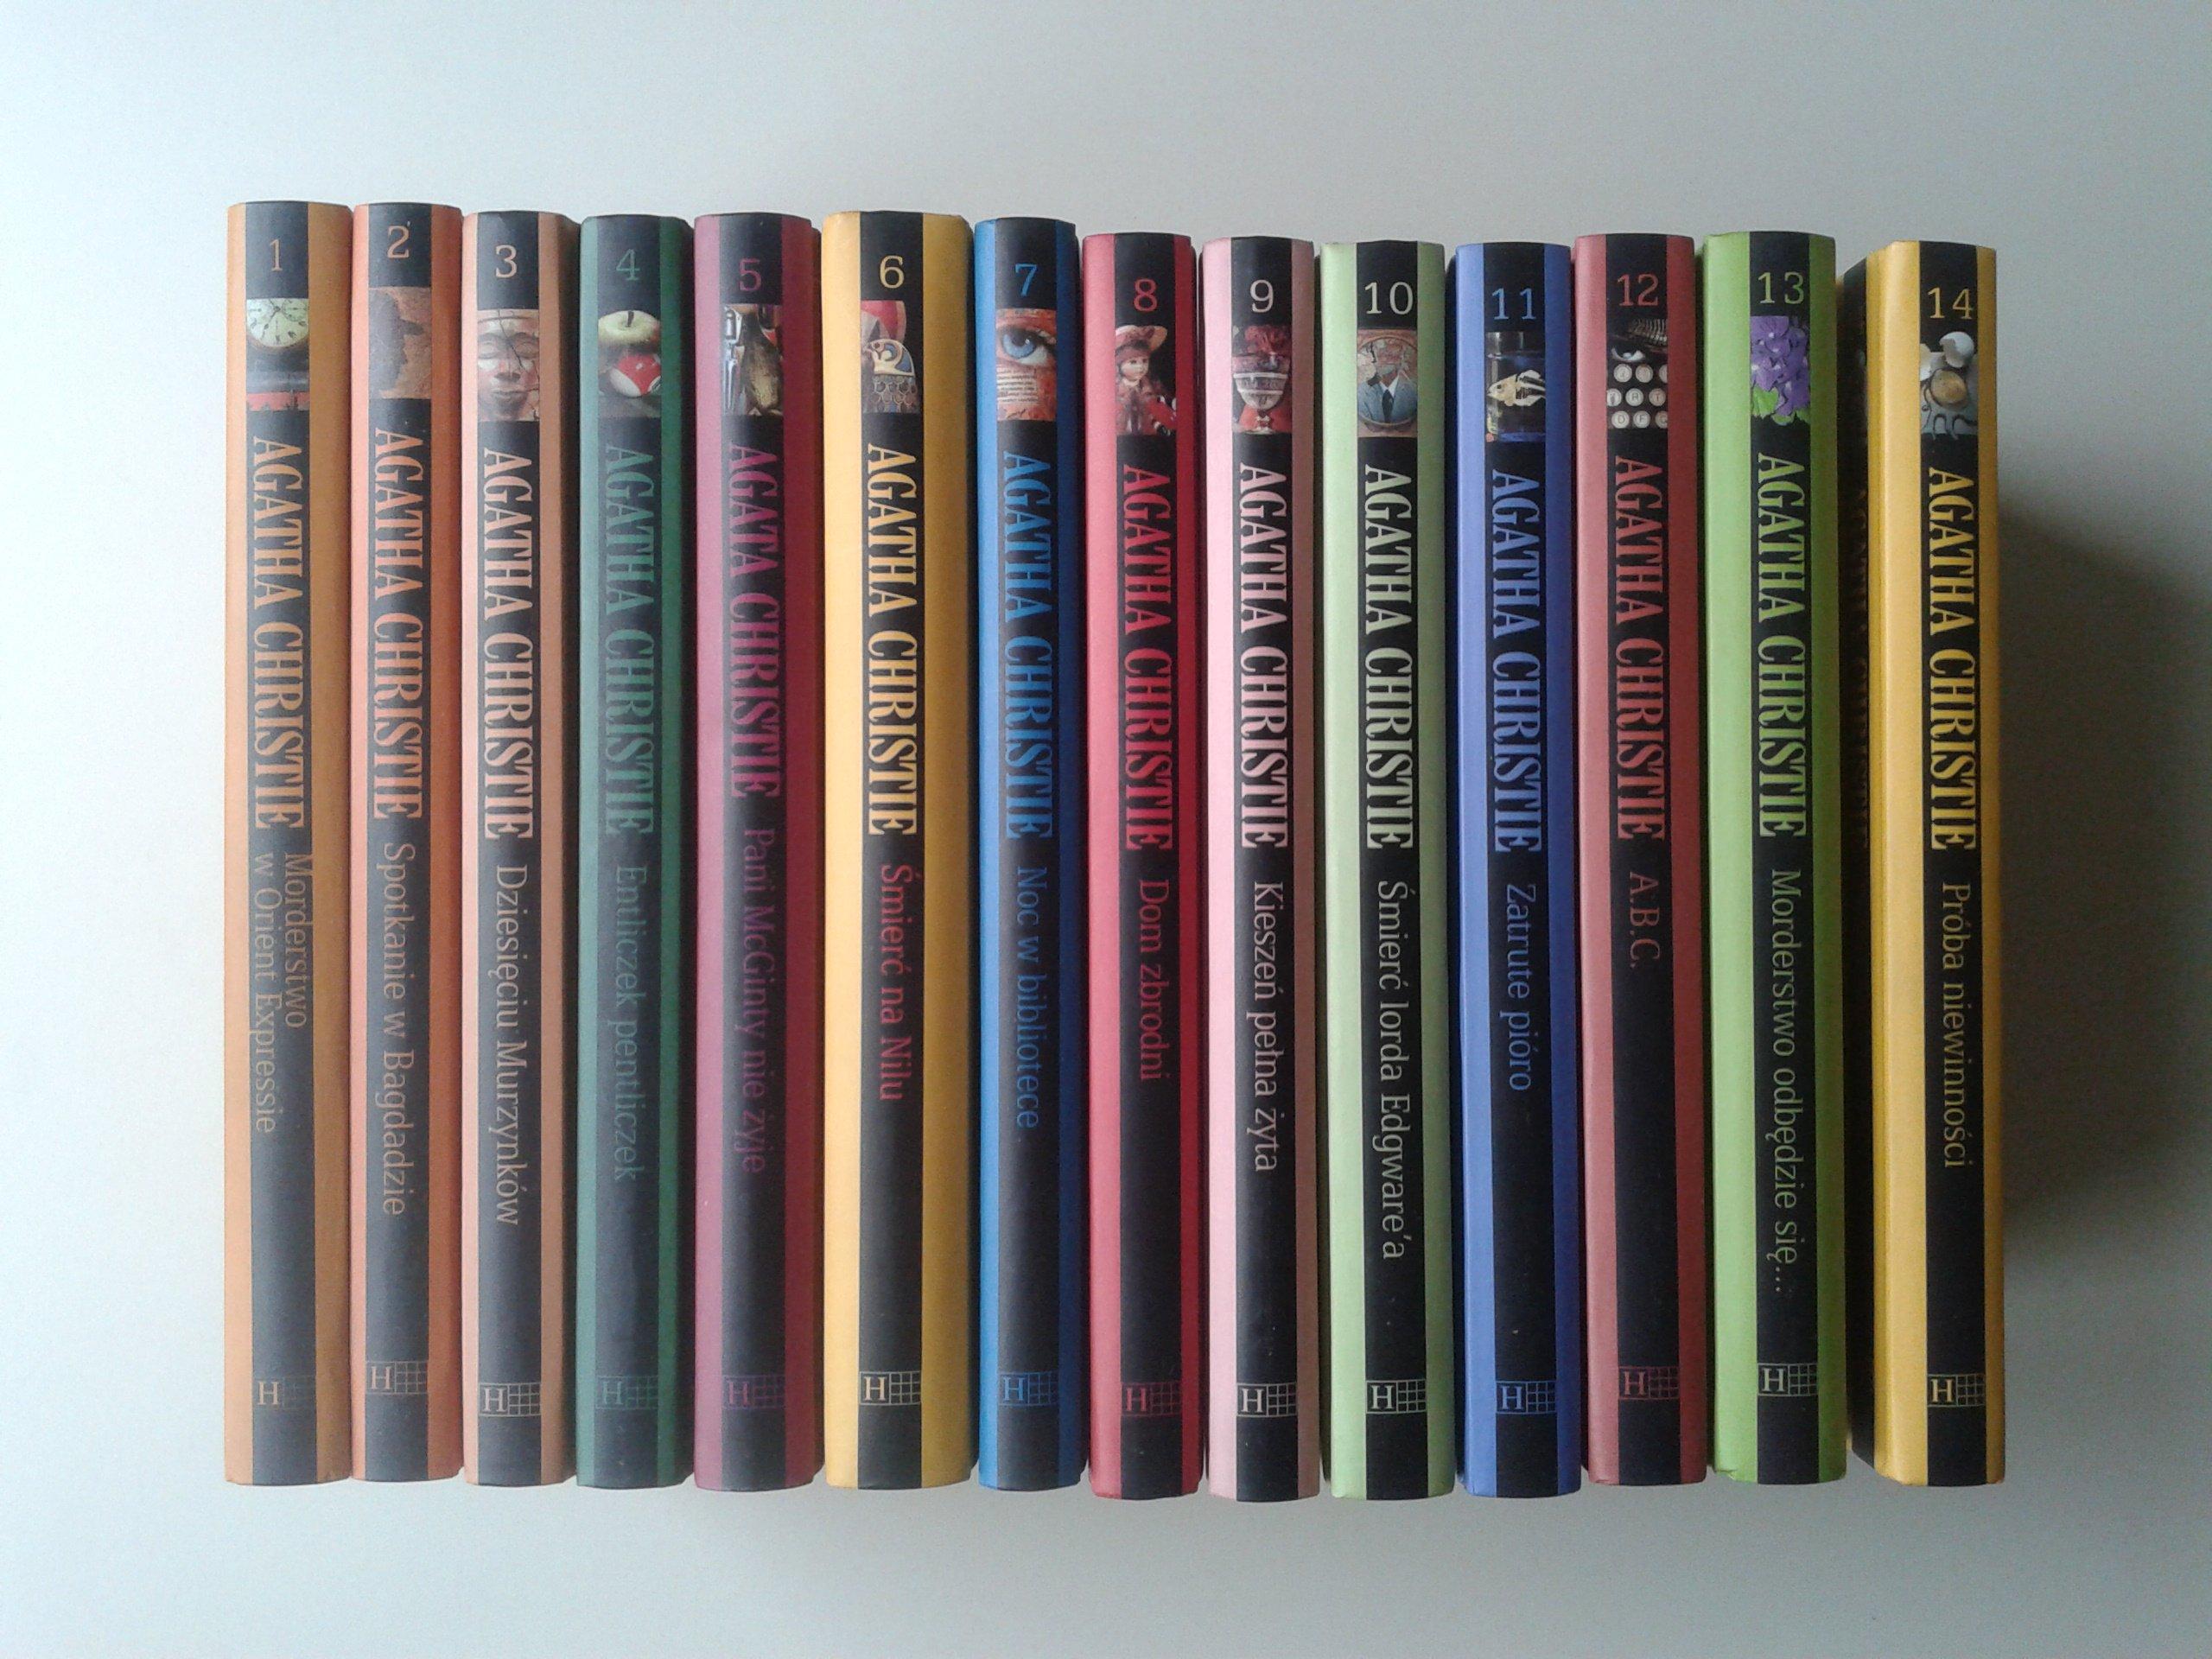 Agatha Christie Kolekcja Hachette 1 14 6957085504 Oficjalne Archiwum Allegro